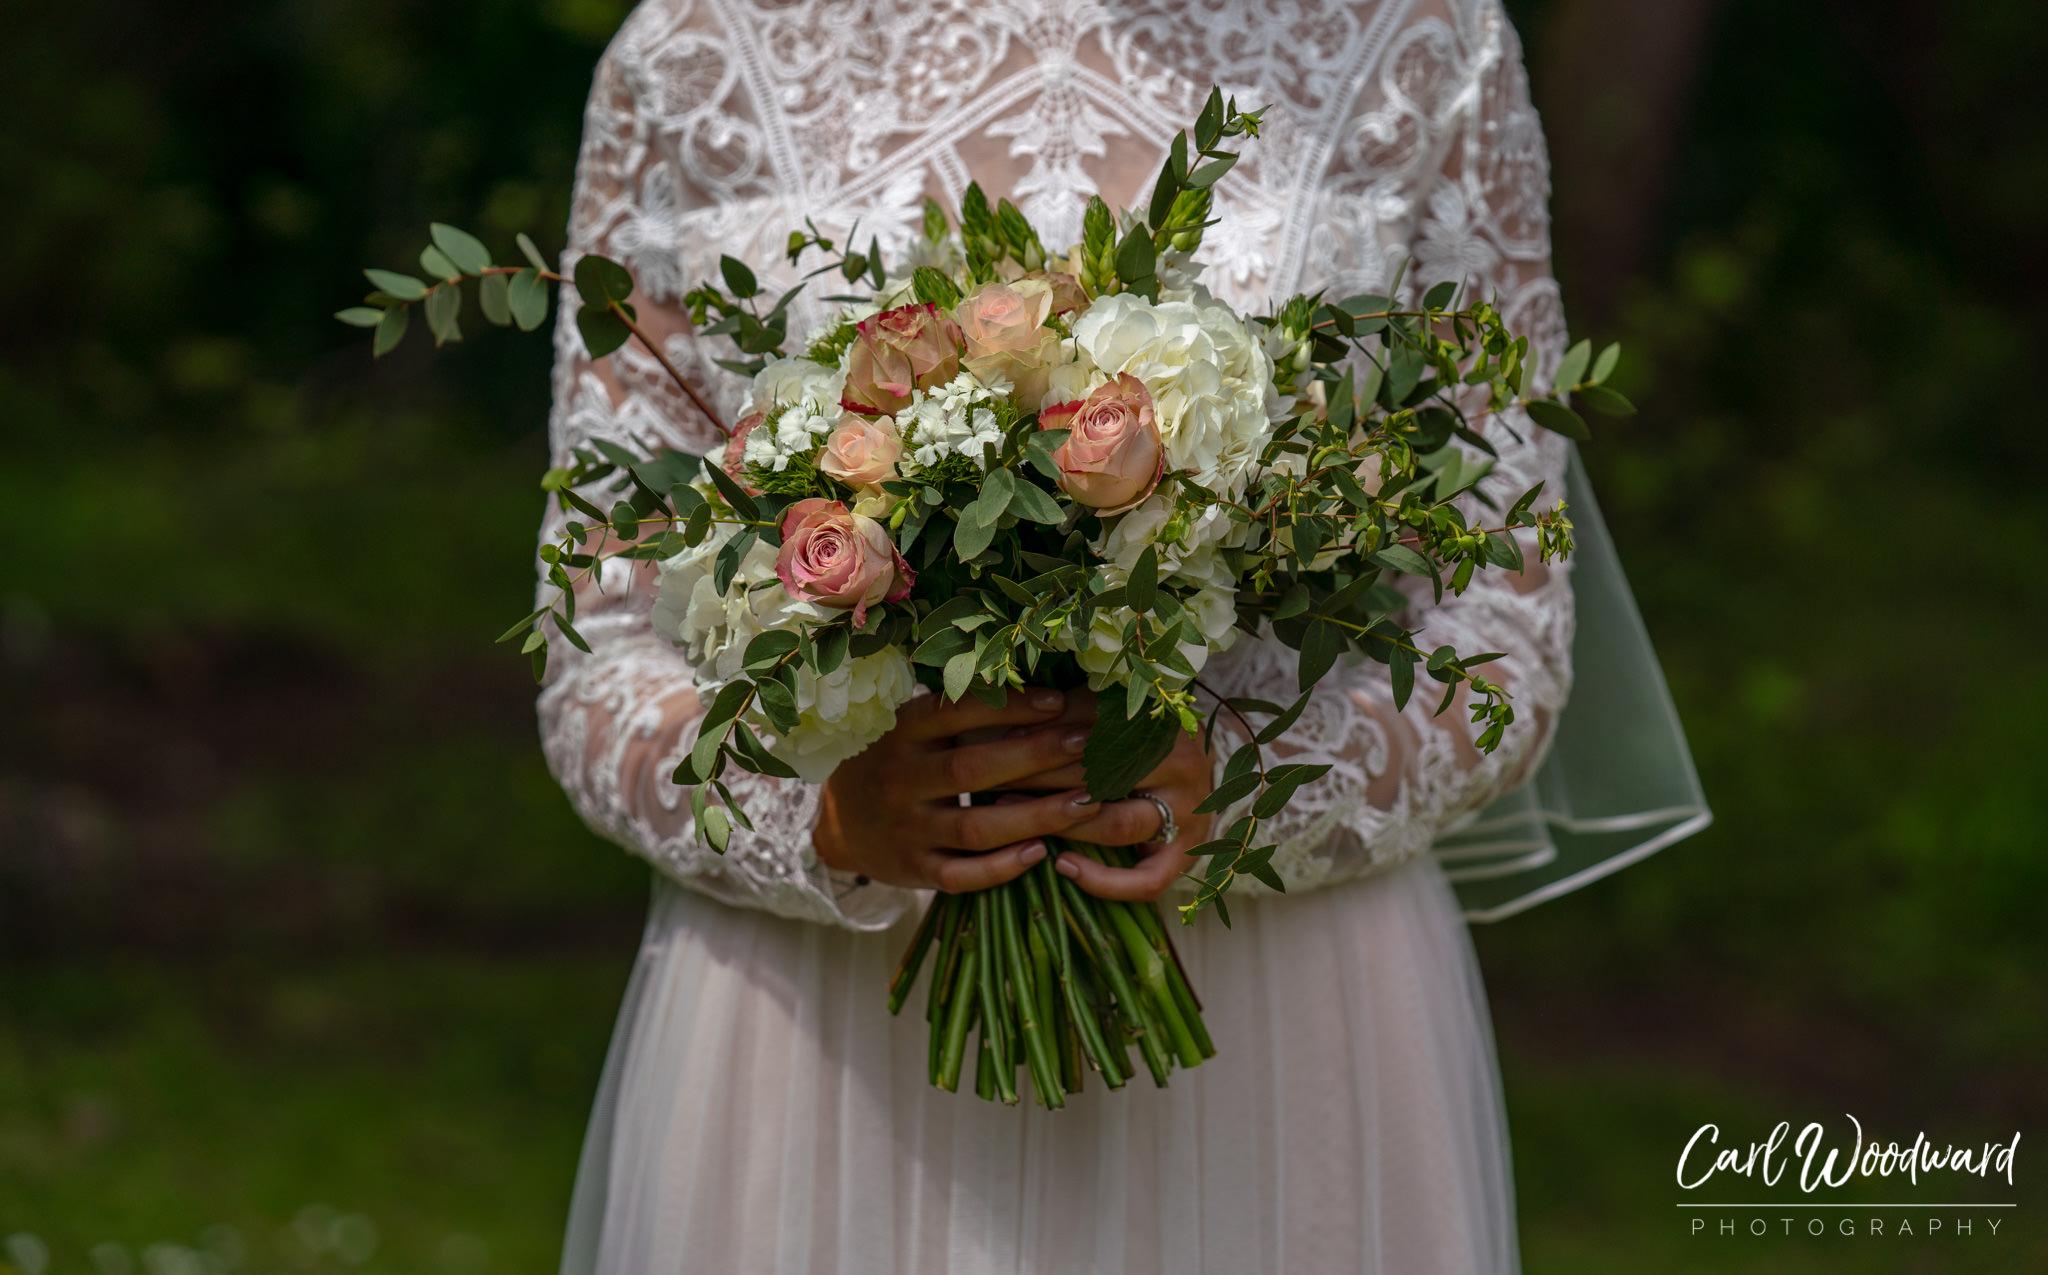 016-pencoed-house-estate-wedding-wedding-photography-cardiff-wedding-photographer.jpg